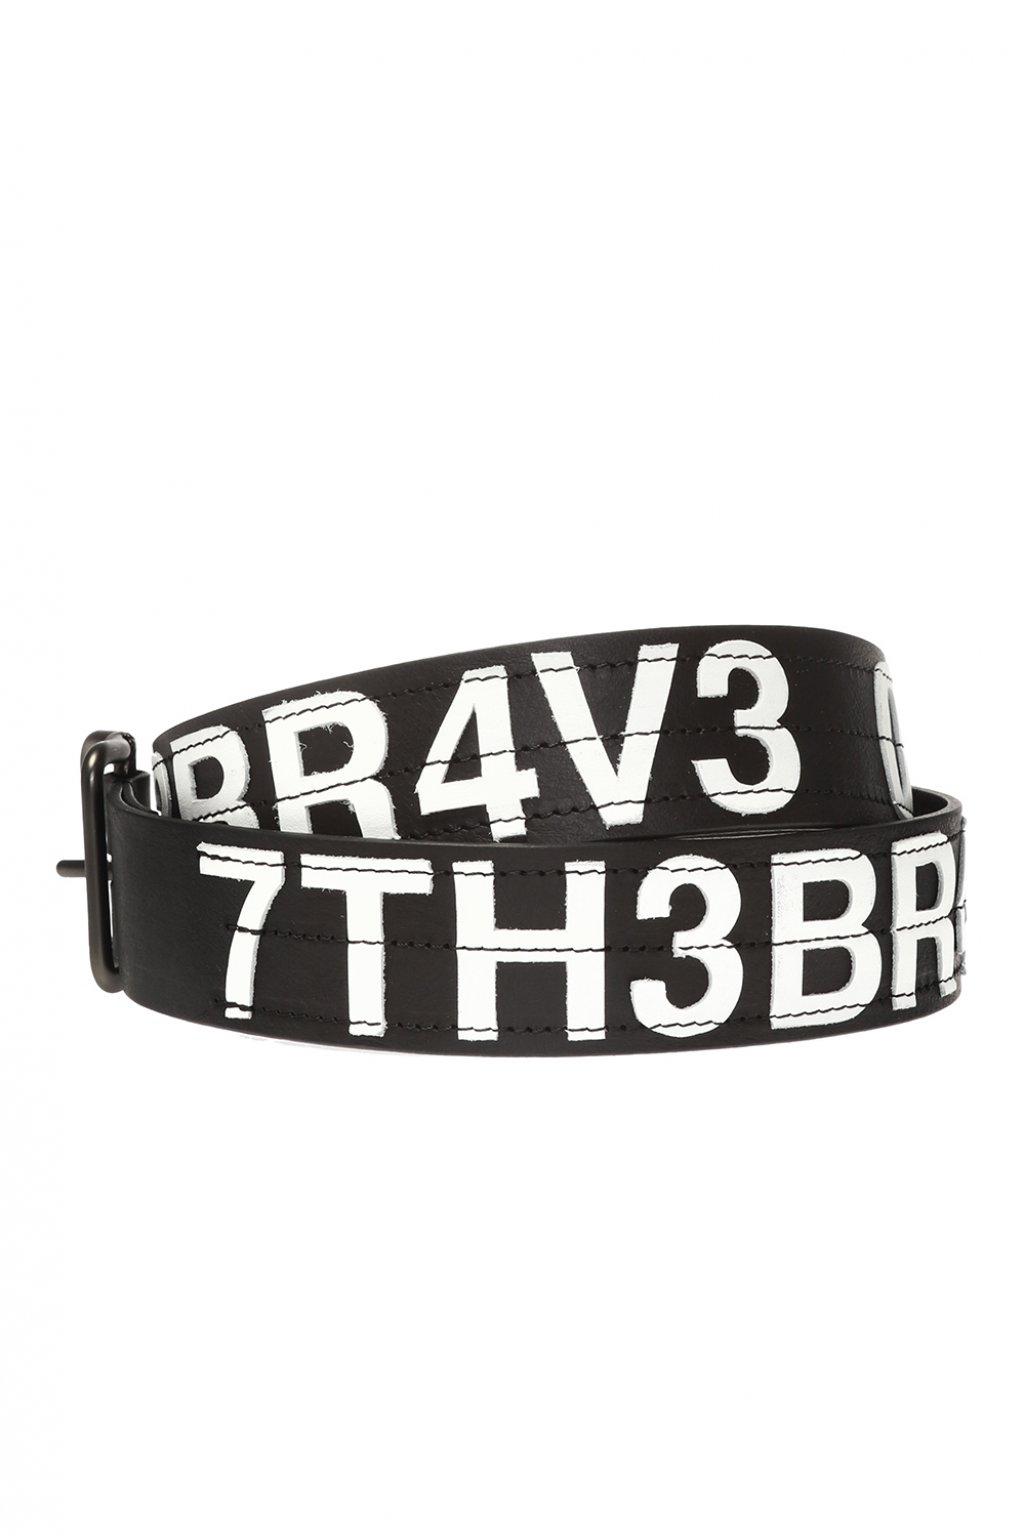 Diesel Belt with tactile lettering